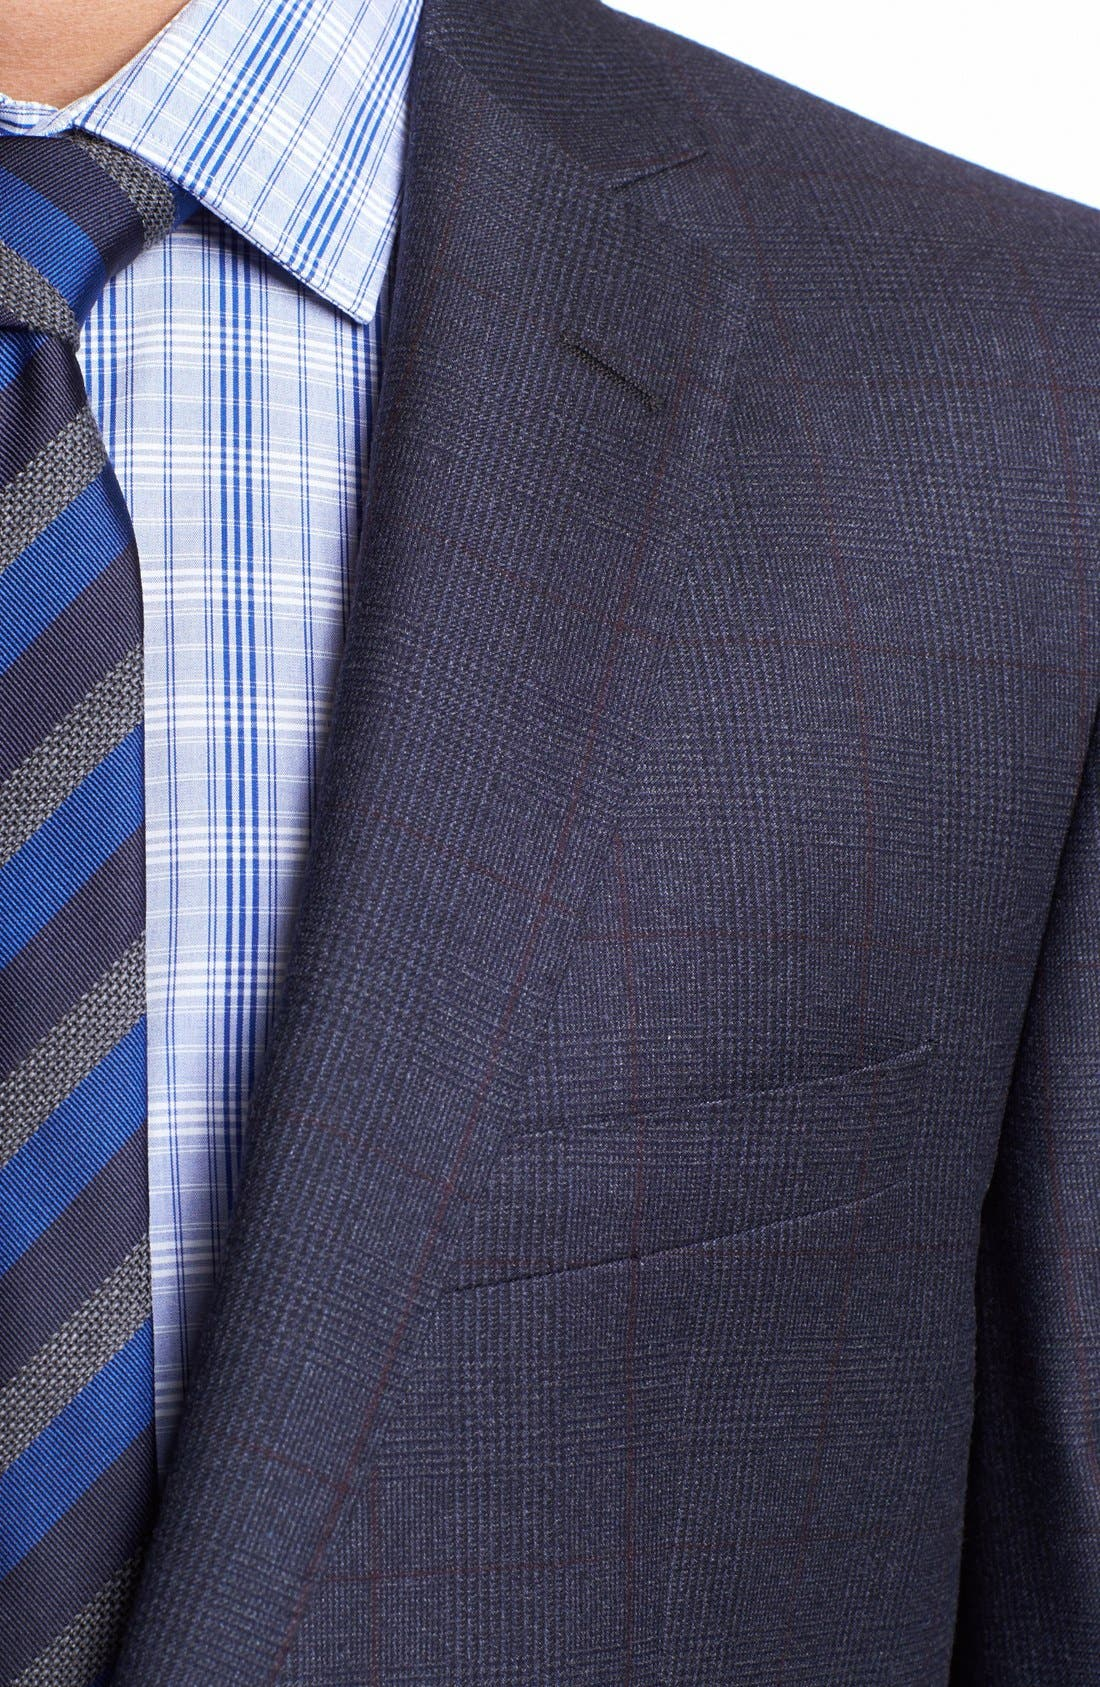 Alternate Image 2  - BOSS HUGO BOSS 'Howard/Court' Trim Fit Plaid Suit